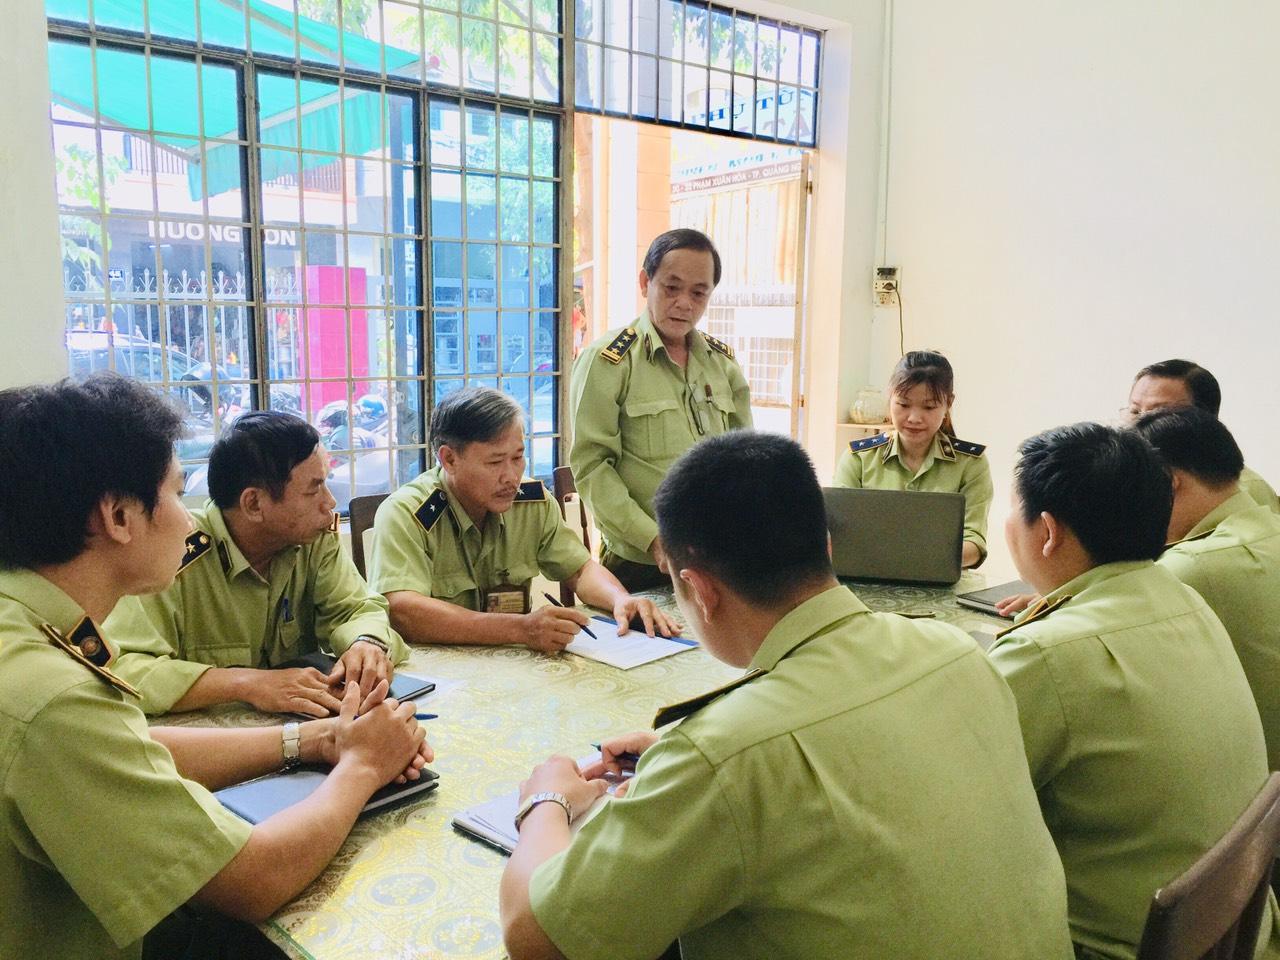 cong viec quan ly thi truong khong duoc lam, thog tu 18/2019/TT-BCT